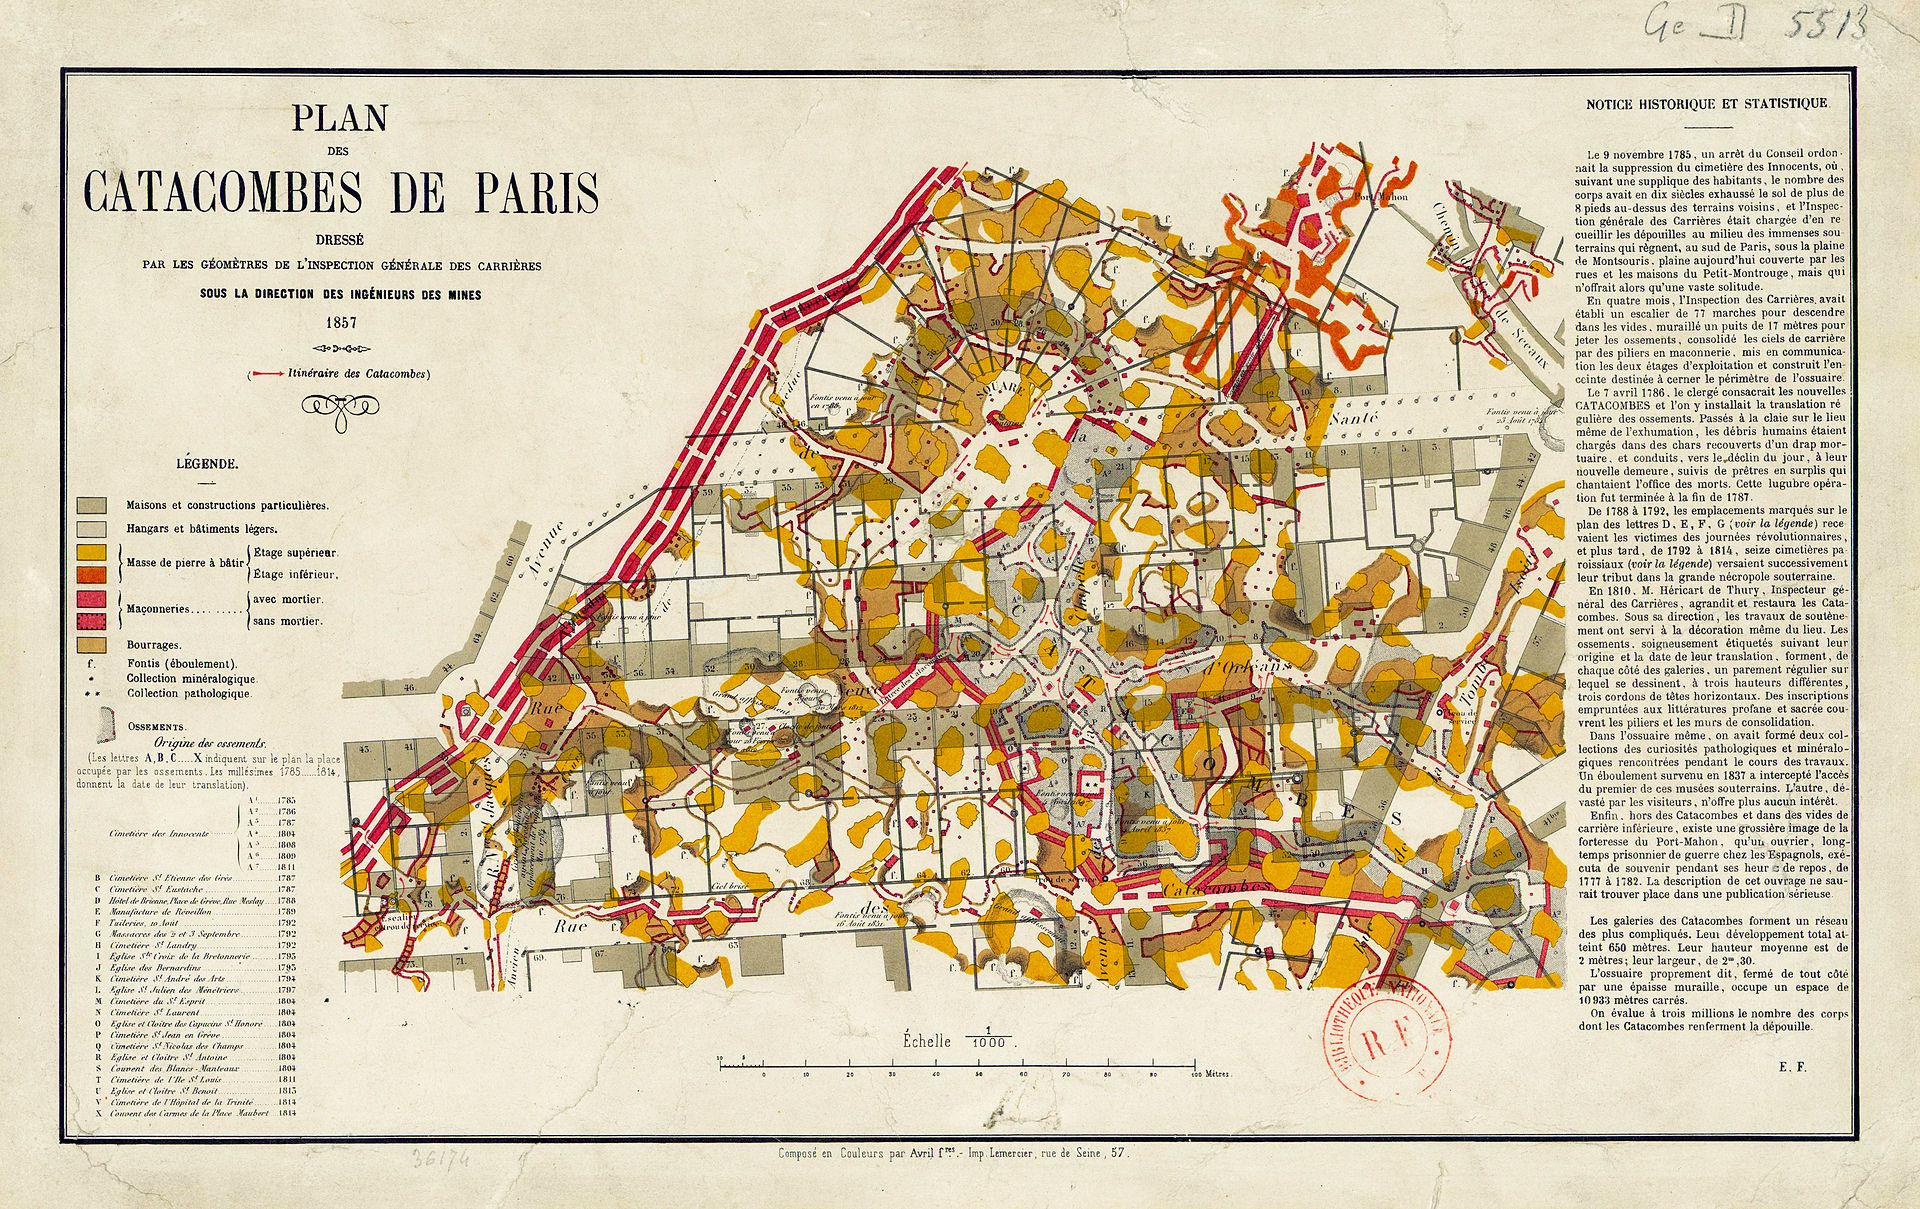 Paris Catacombs map of 1857